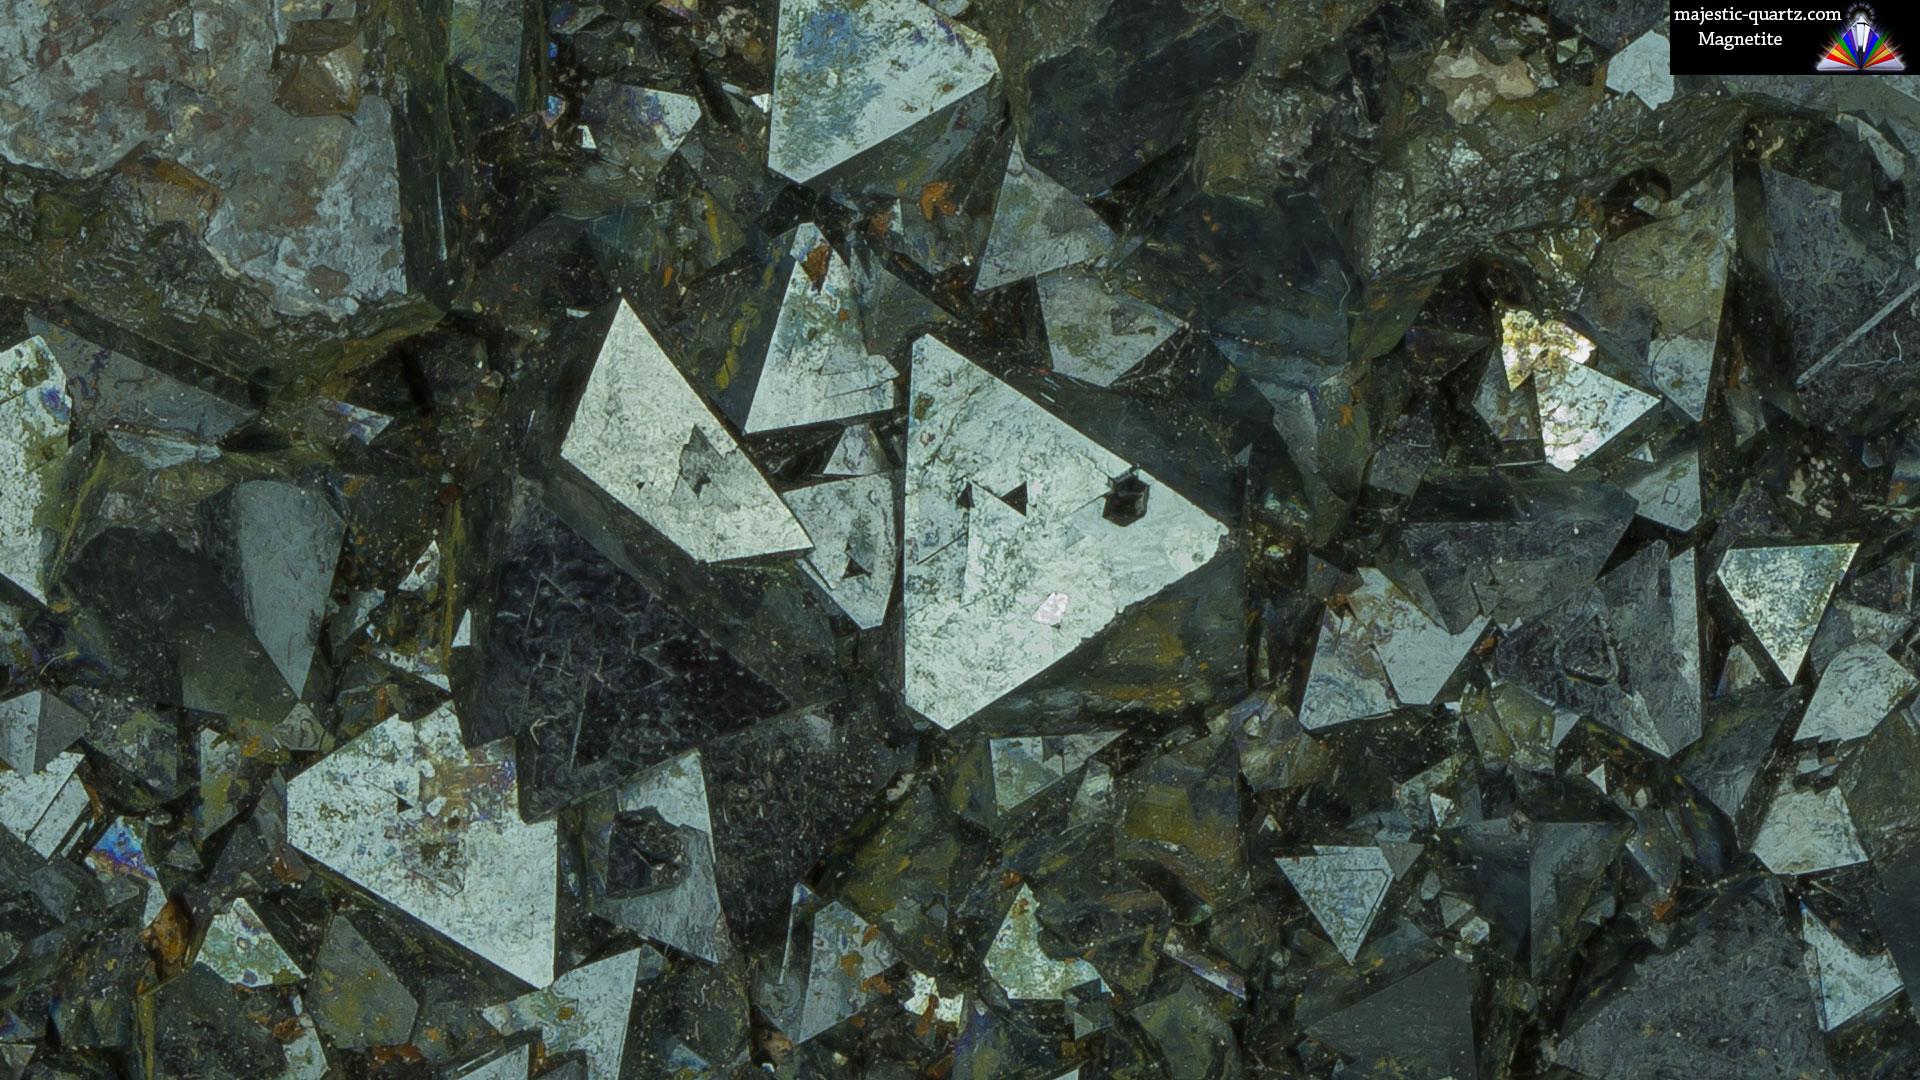 Magnetite Mineral Specimen - Photograph by Anthony Bradford